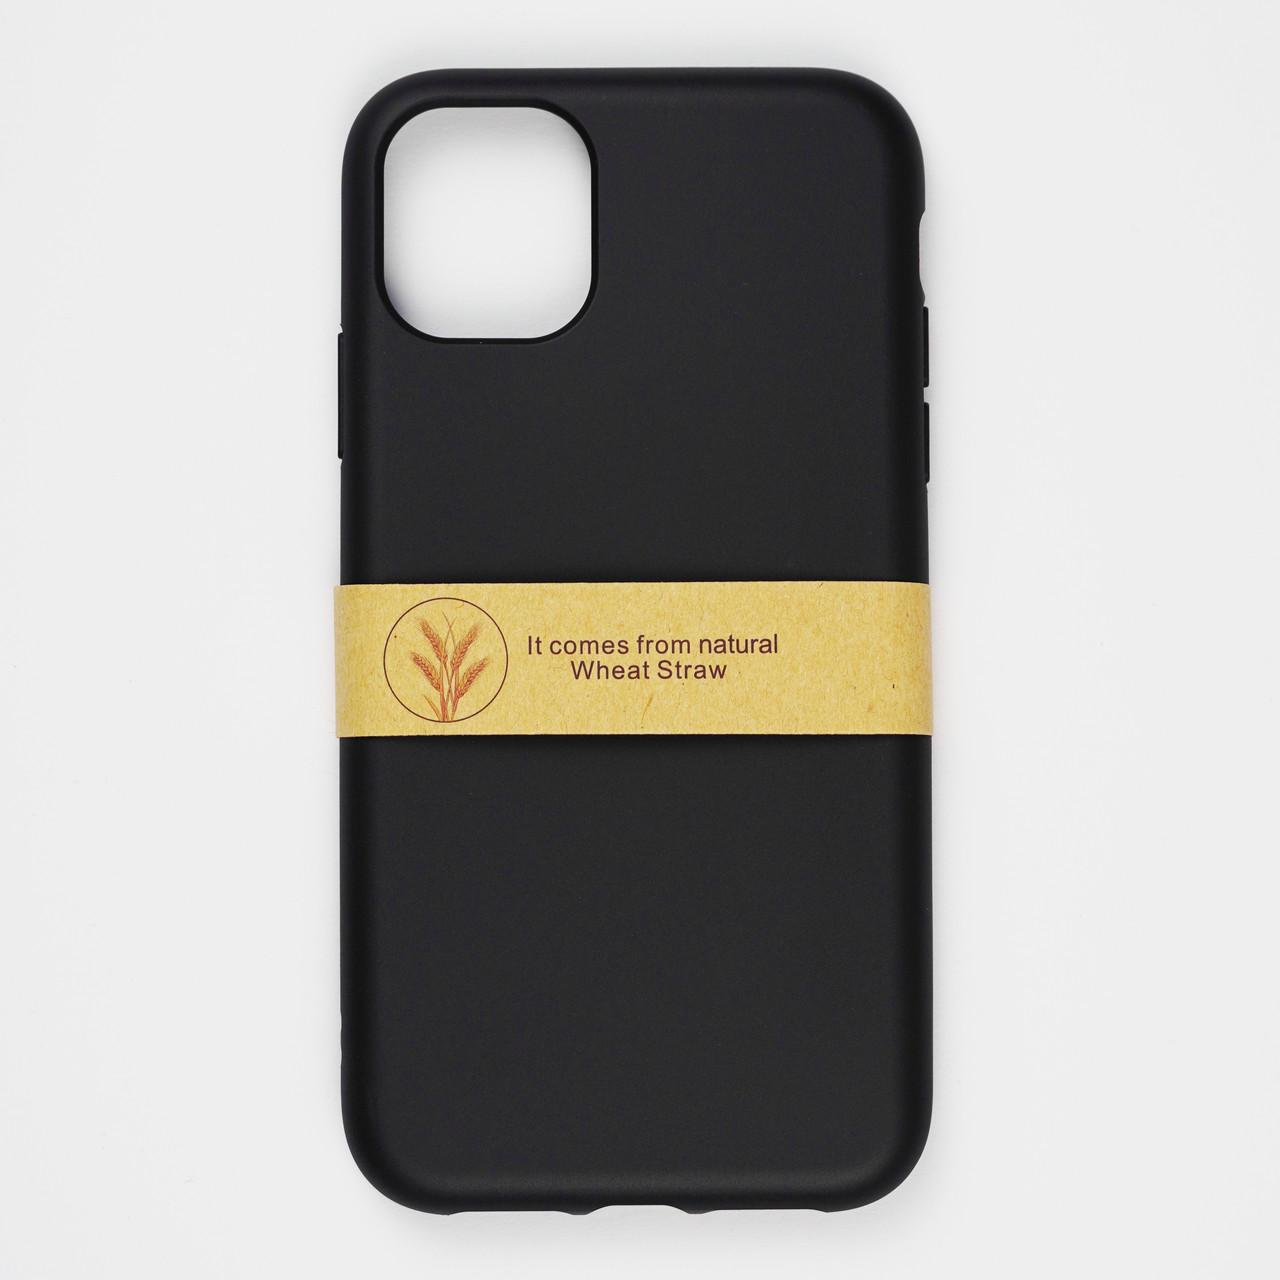 Биоразлагаемый чехол ECO Wheat Straw для iPhone 11 Black